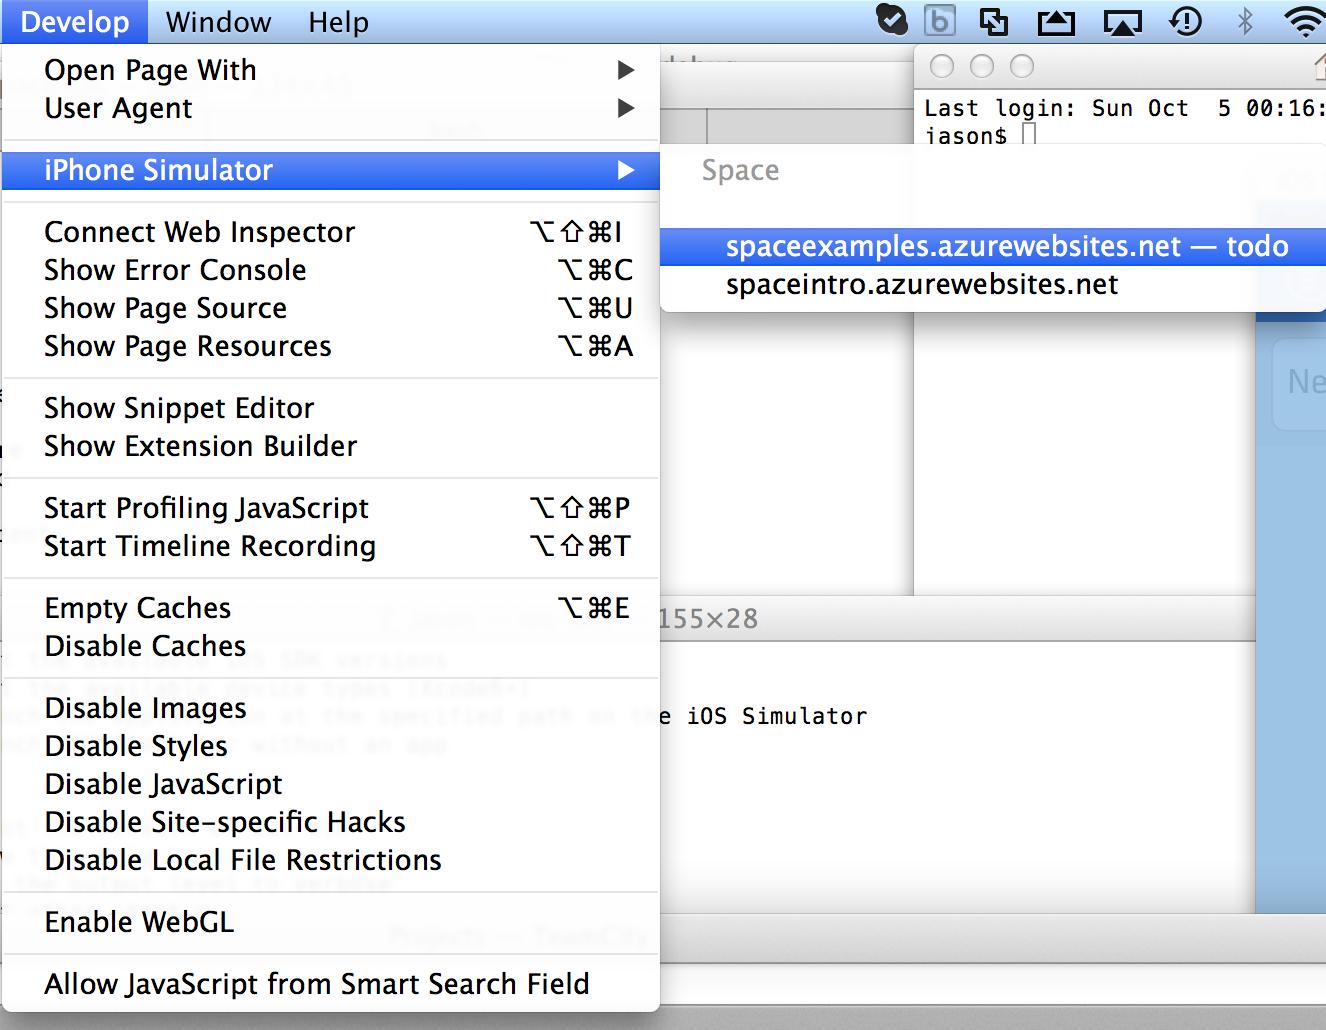 Web App Manager Guides | Application Debugging